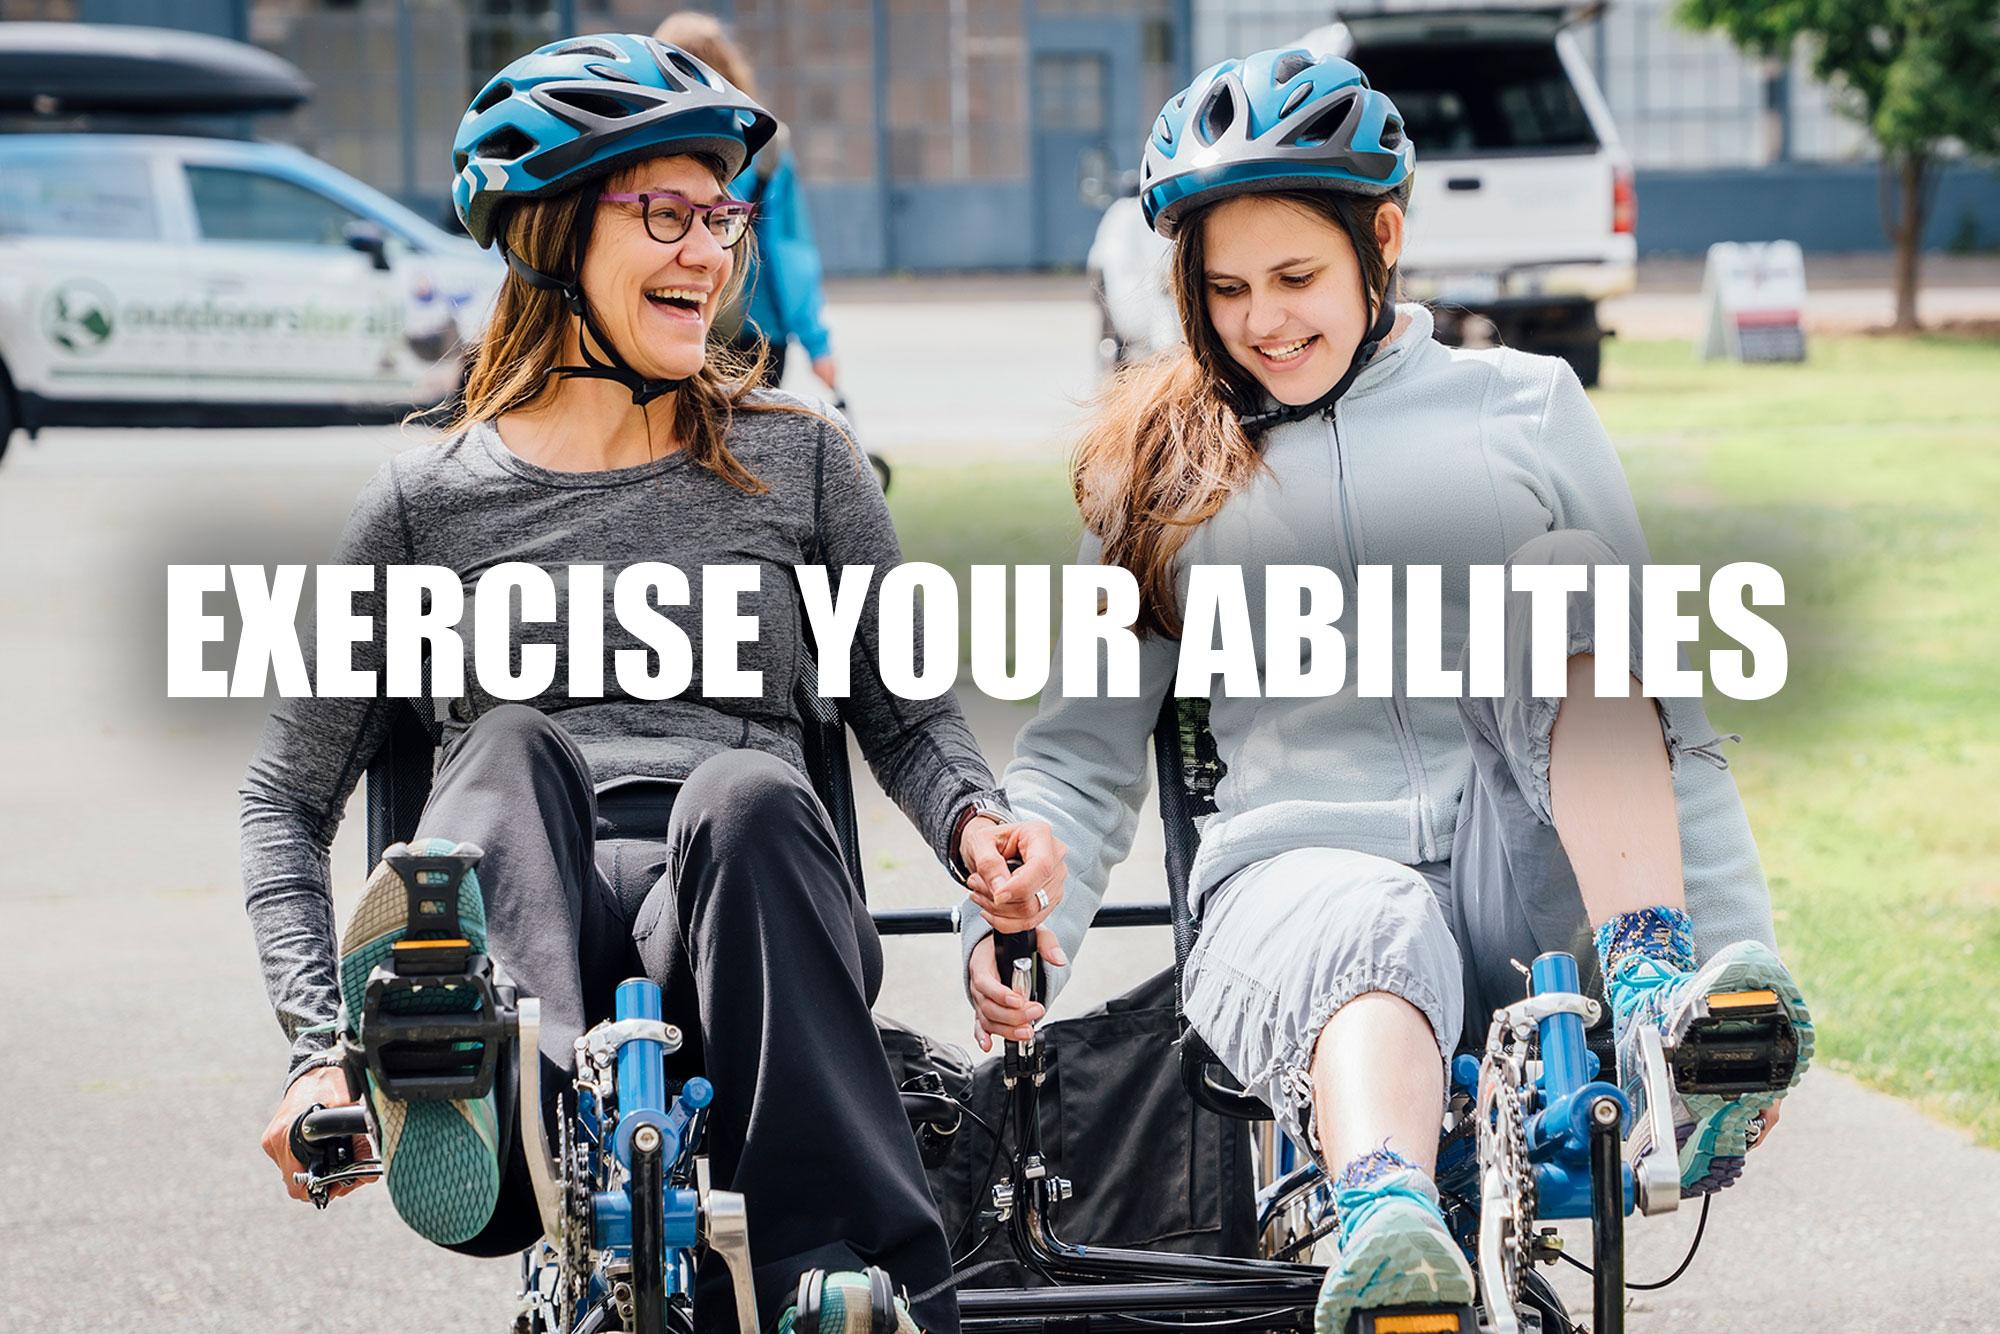 Exercise Abilities